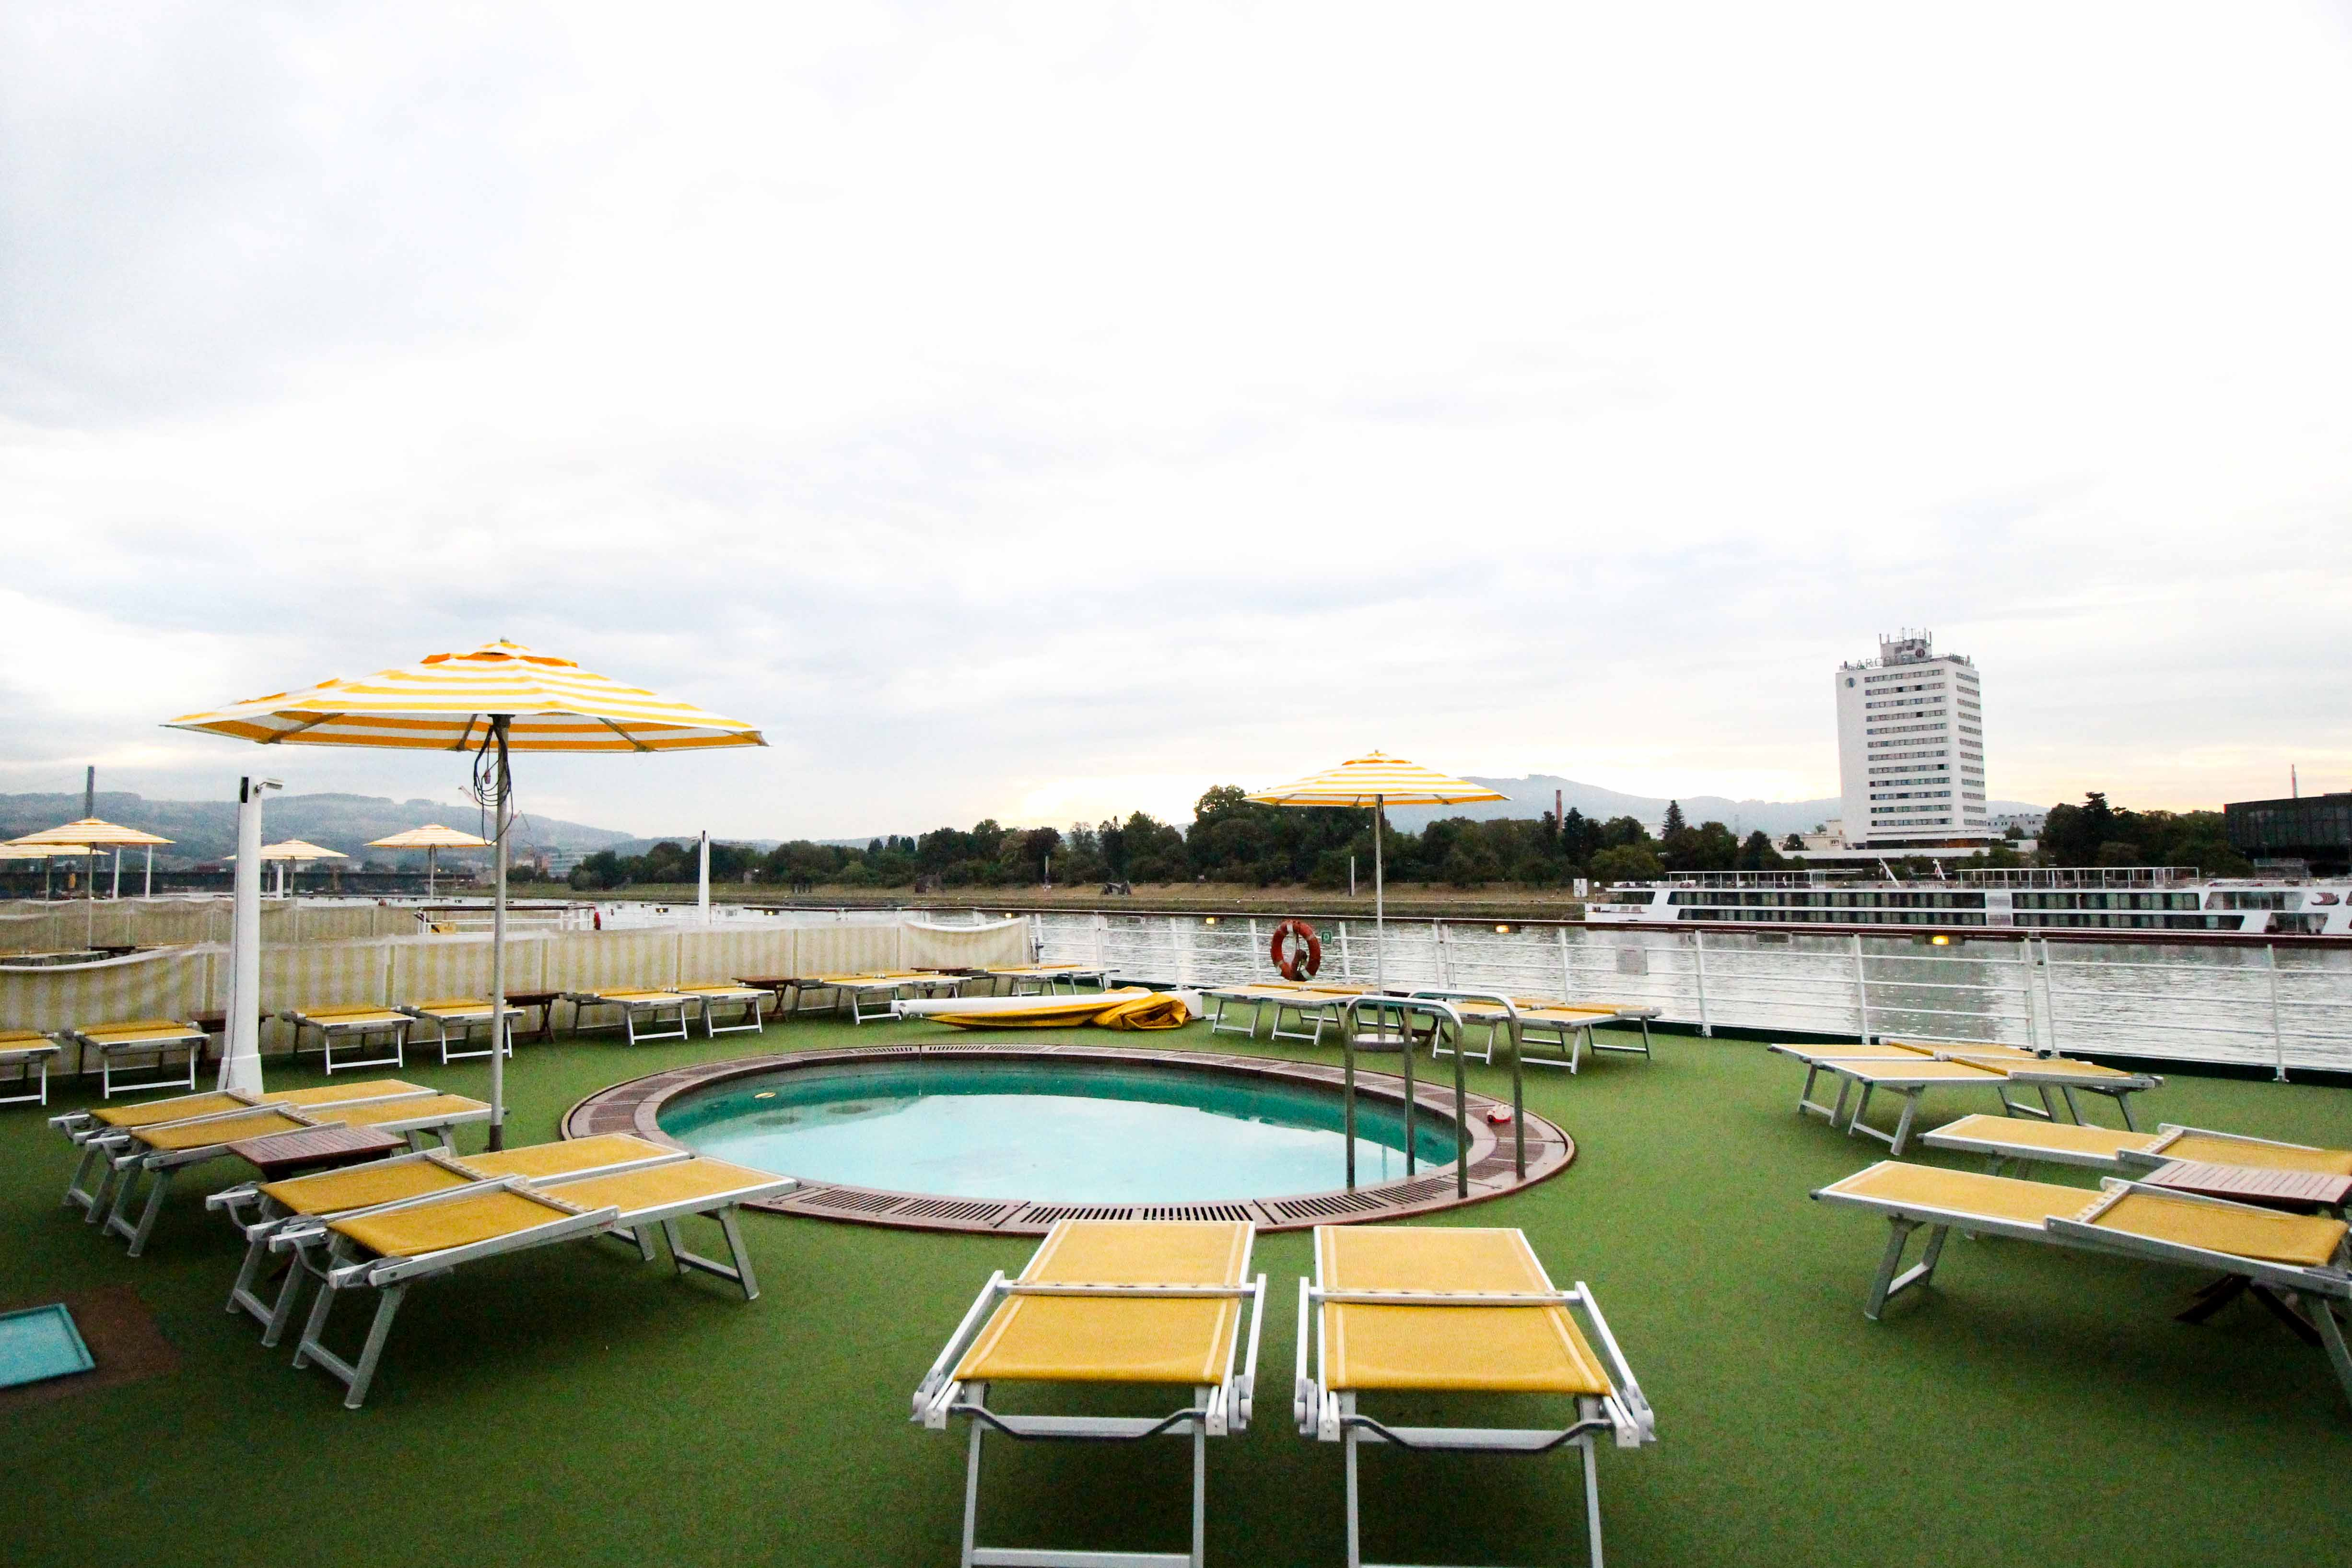 Donaukreuzfahrt A-Rosa Bella Sonnendeck Pool Flusskreuzfahrt Flusskreuzfahrtschiff Donau Melk 7 Tage Donau Klassik Tour Arosa Reiseblogger